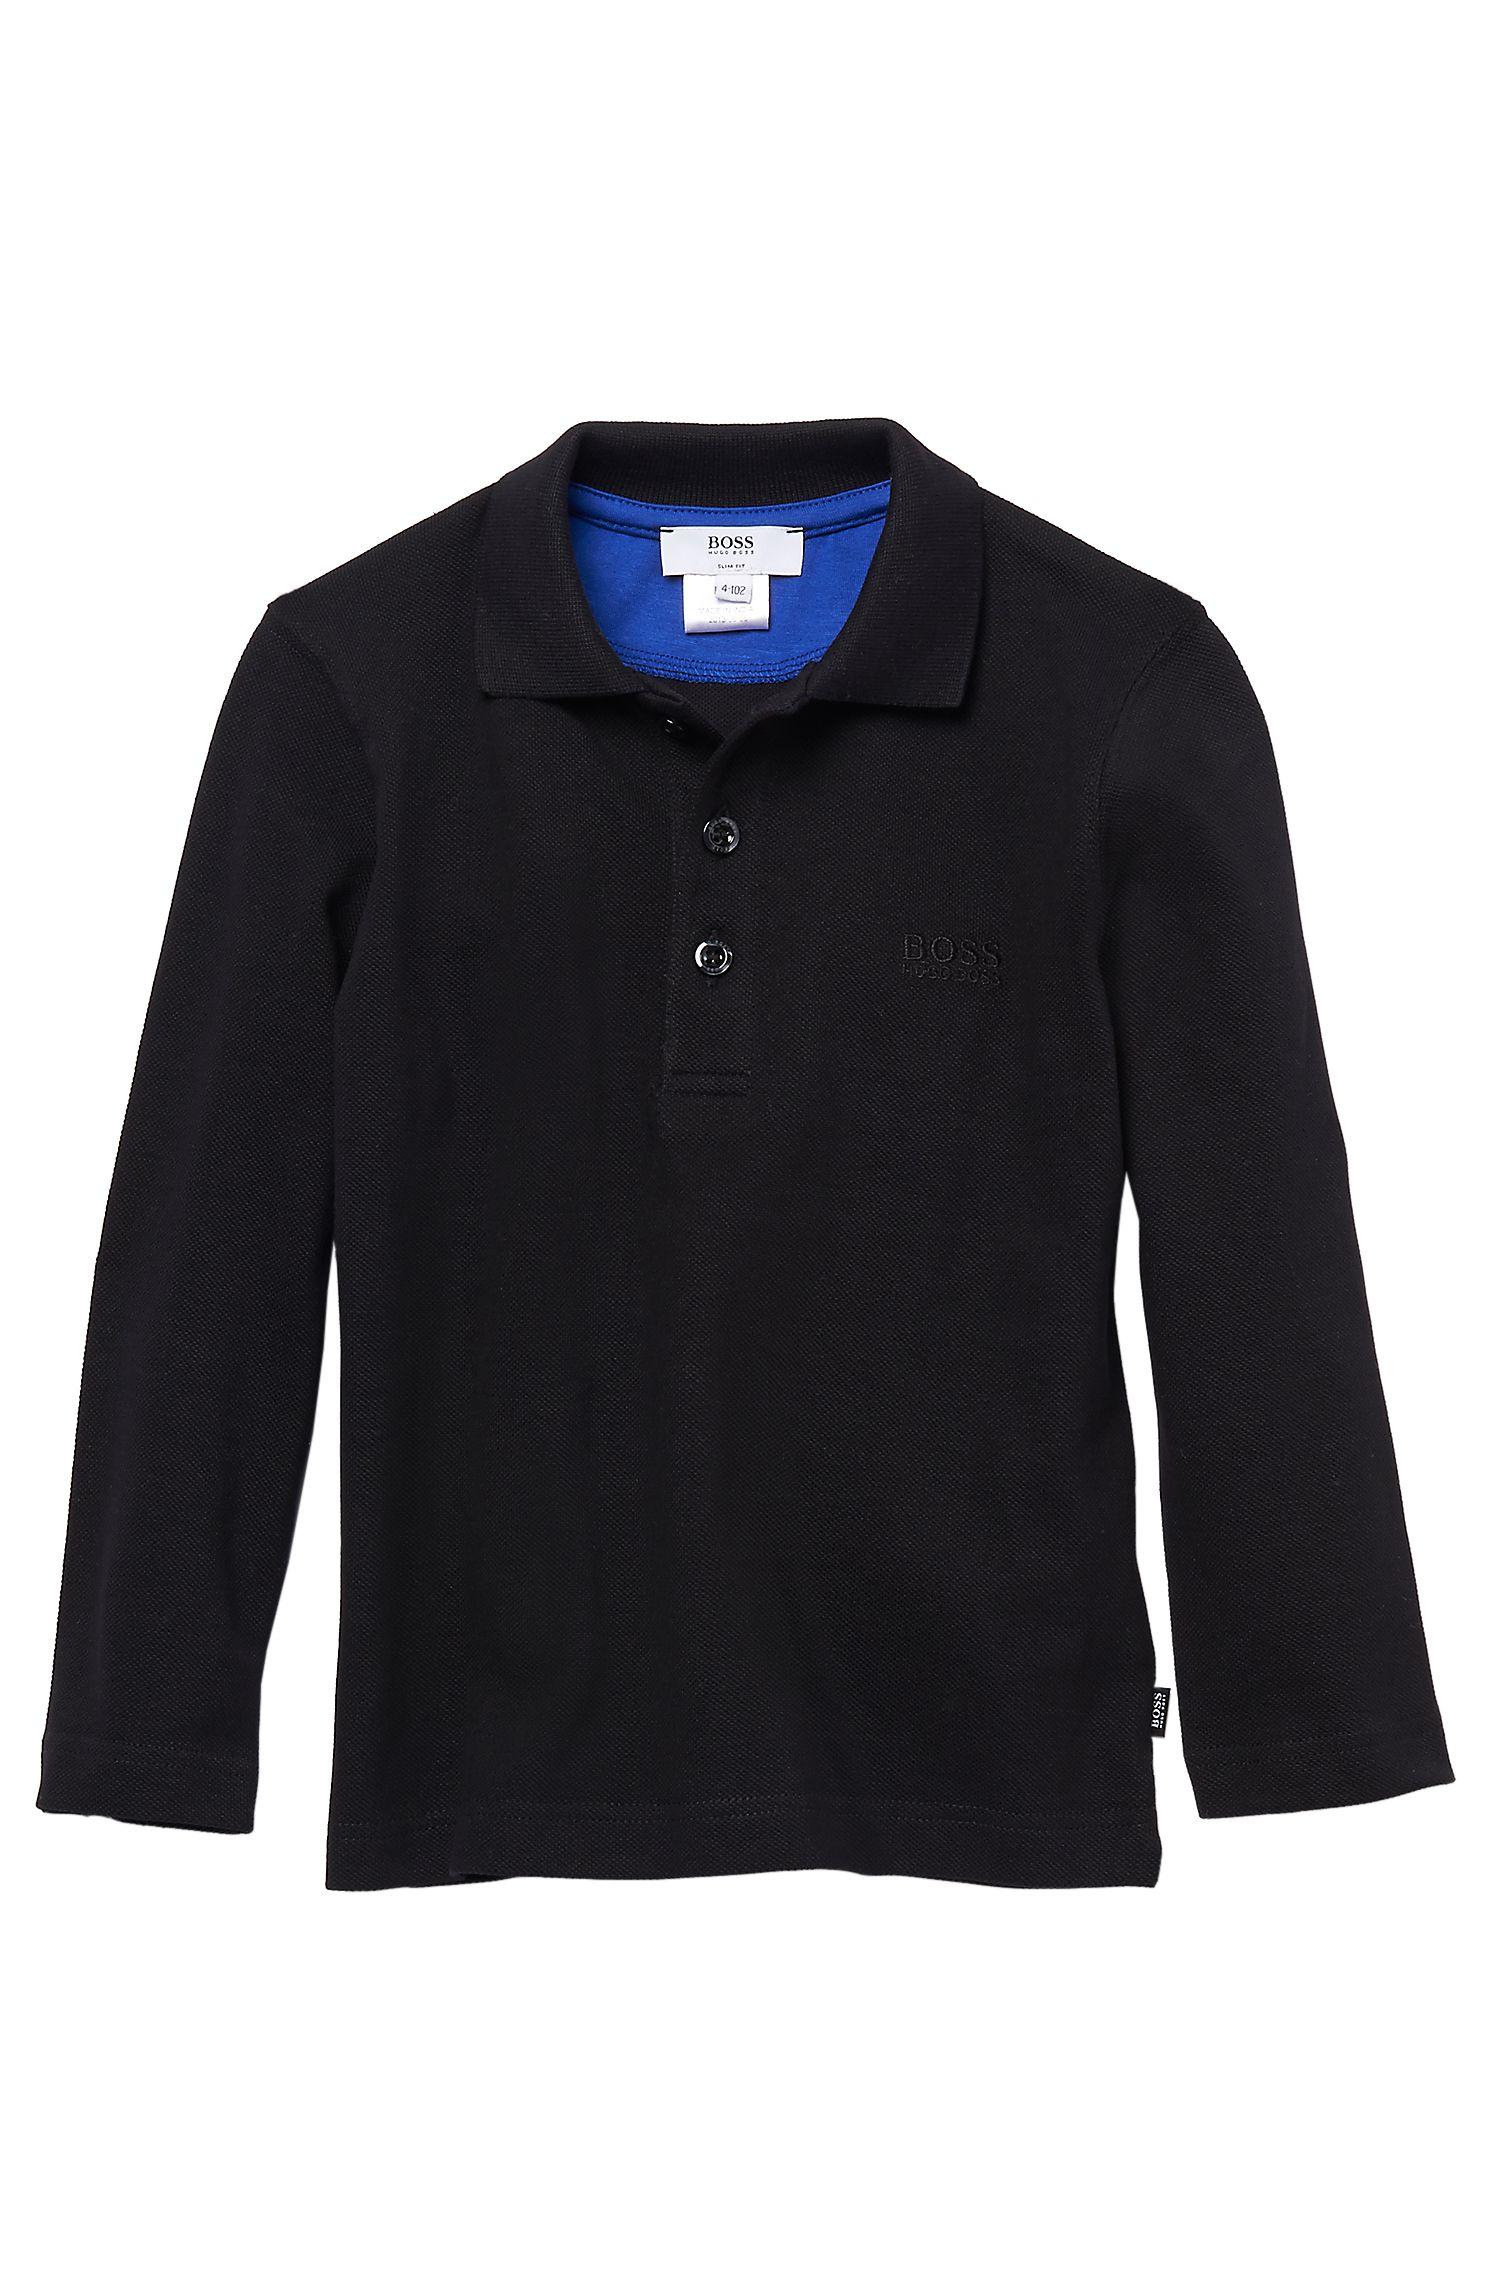 'J25545'   Boys Long-Sleeved Cotton Polo Shirt